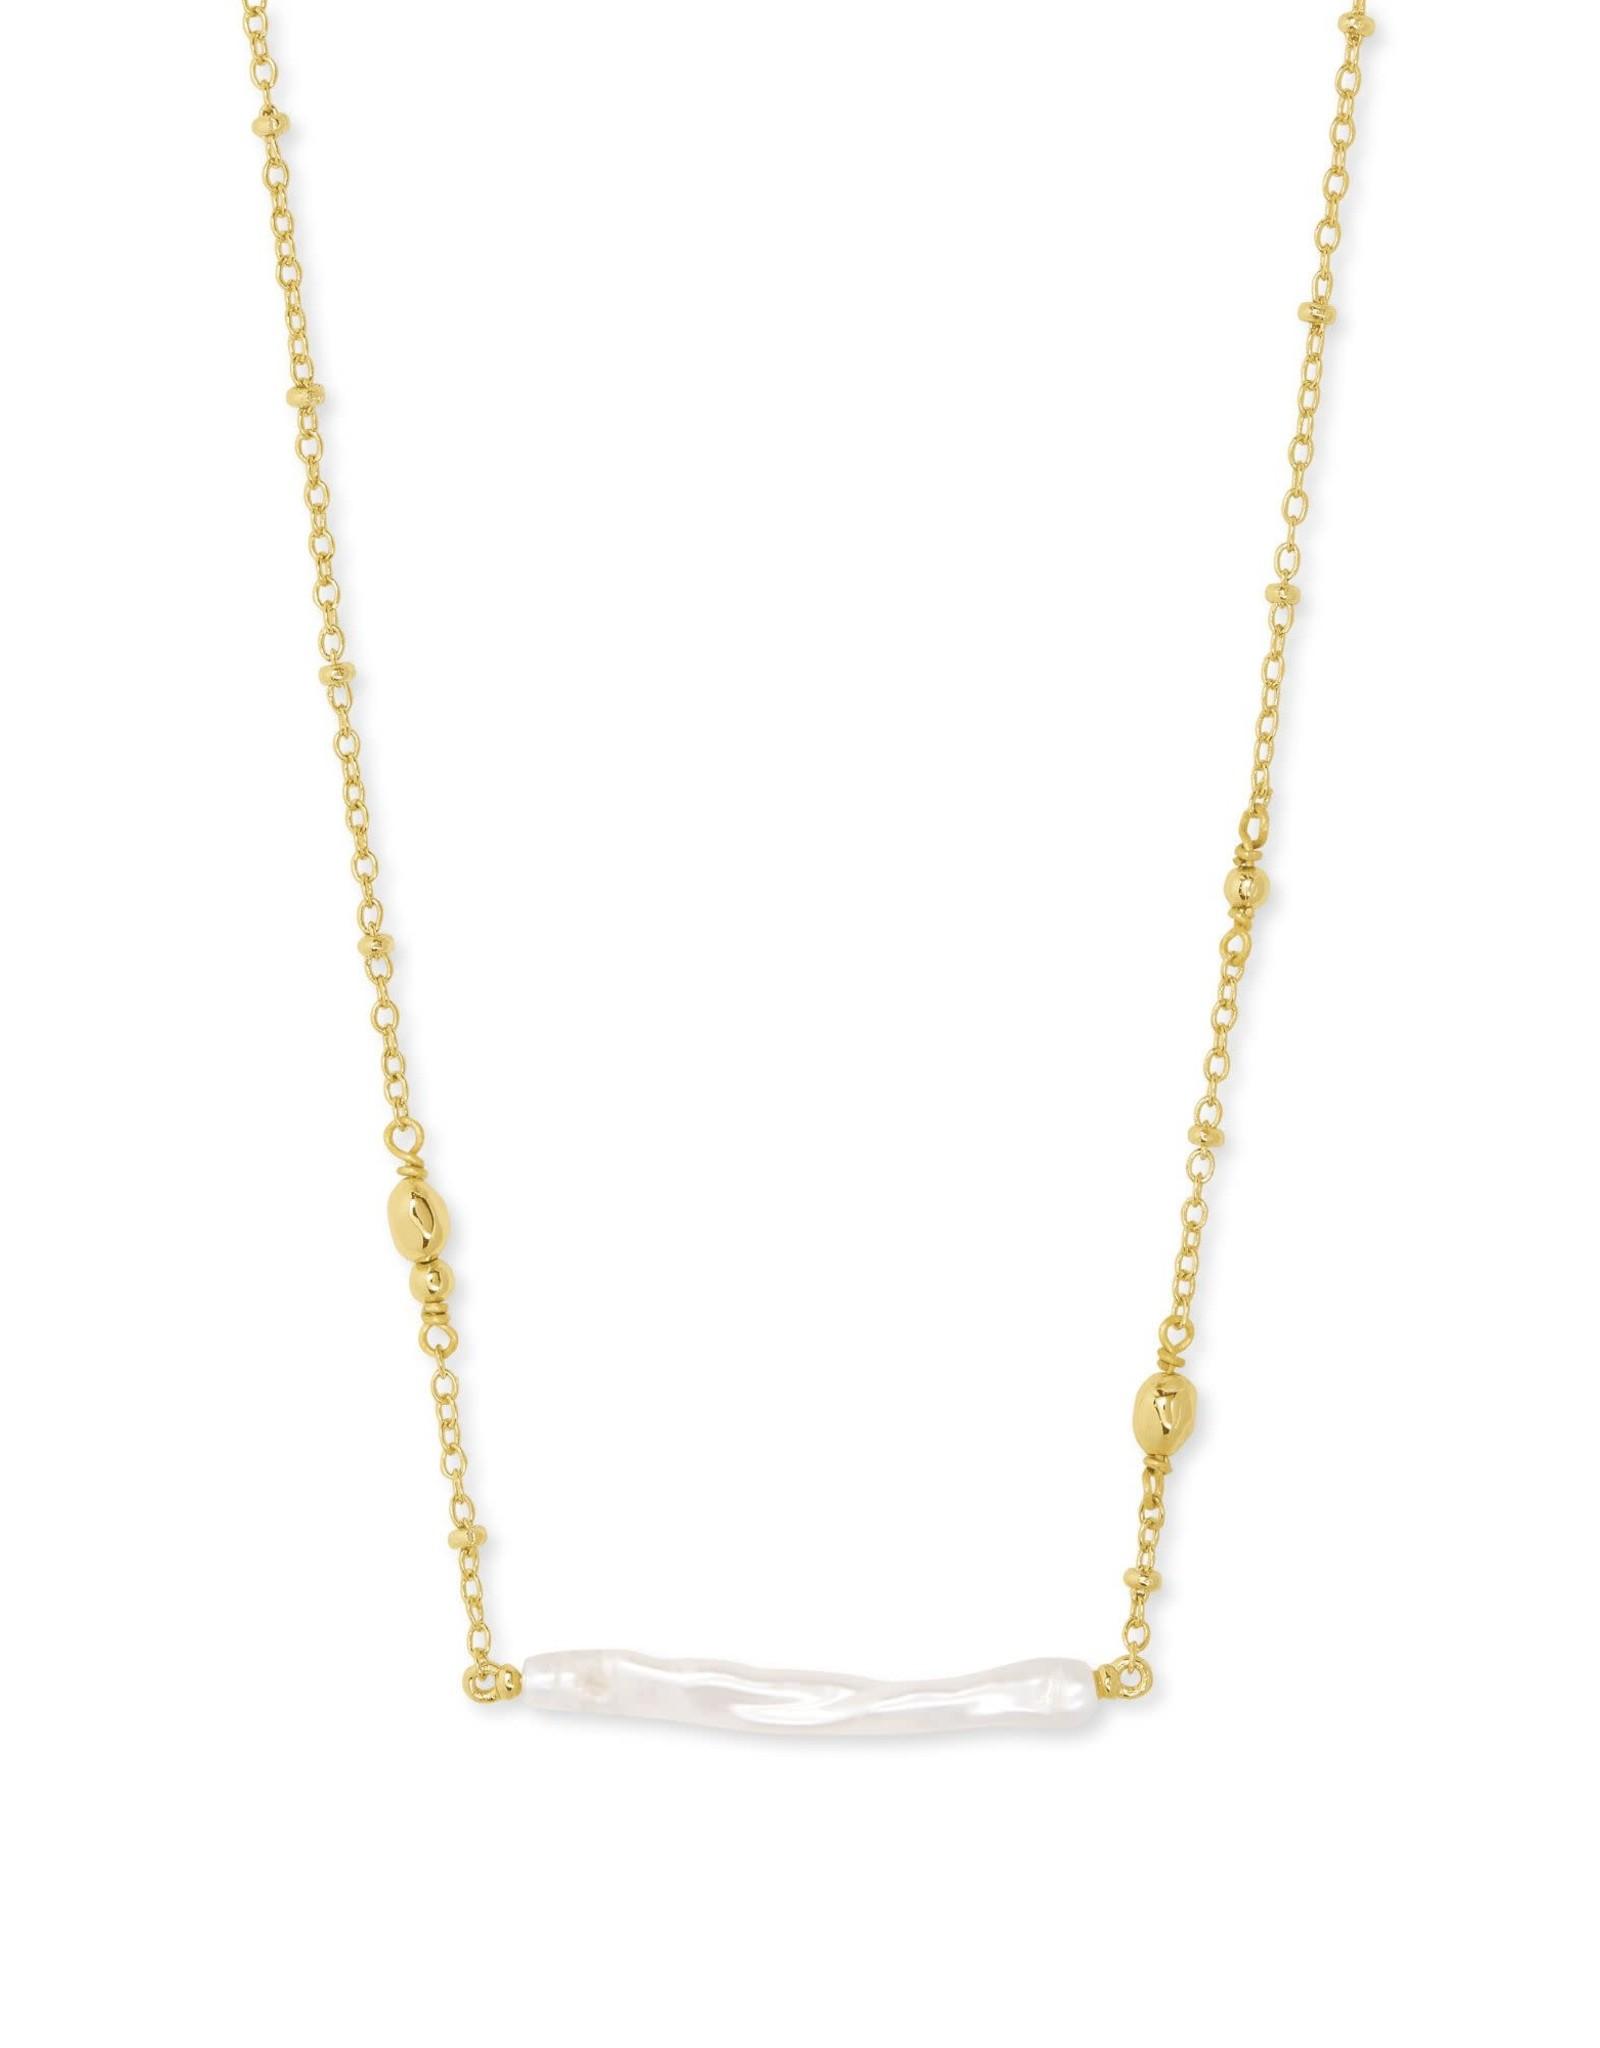 Kendra Scott Eileen Pendant Necklace - White Pearl/Gold